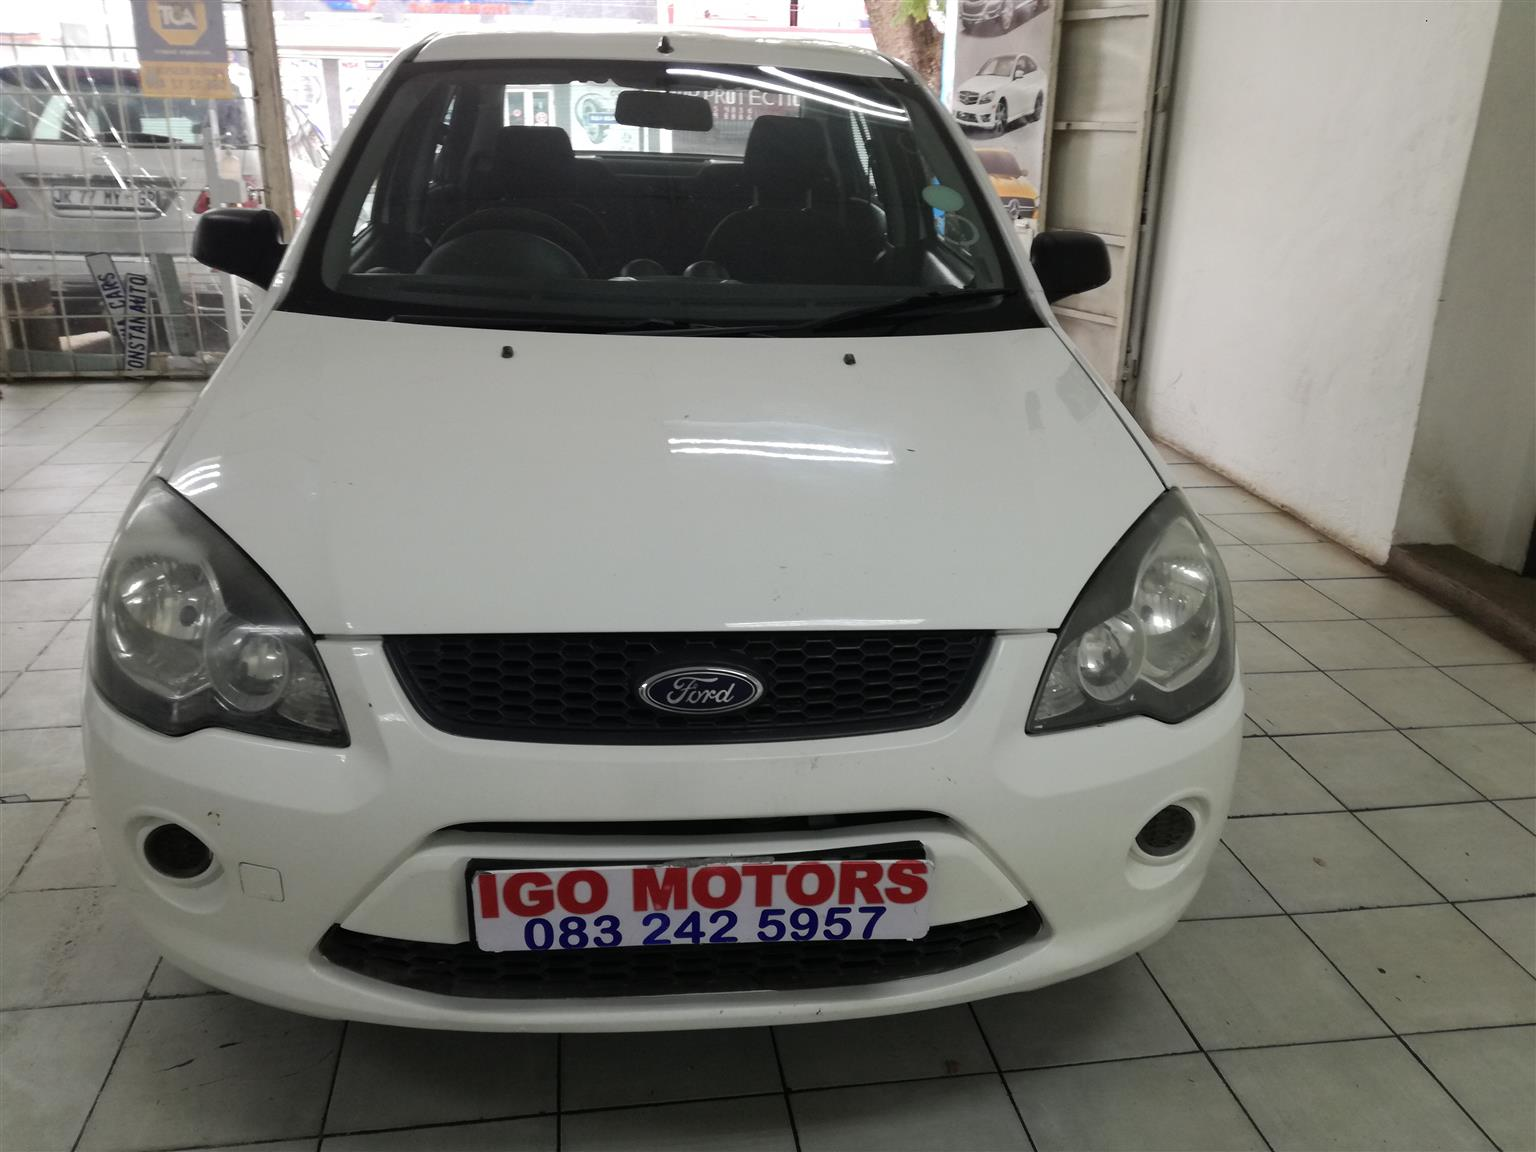 2014 Ford Ikon Sedan 1.6 Manual 85,000km R64,000